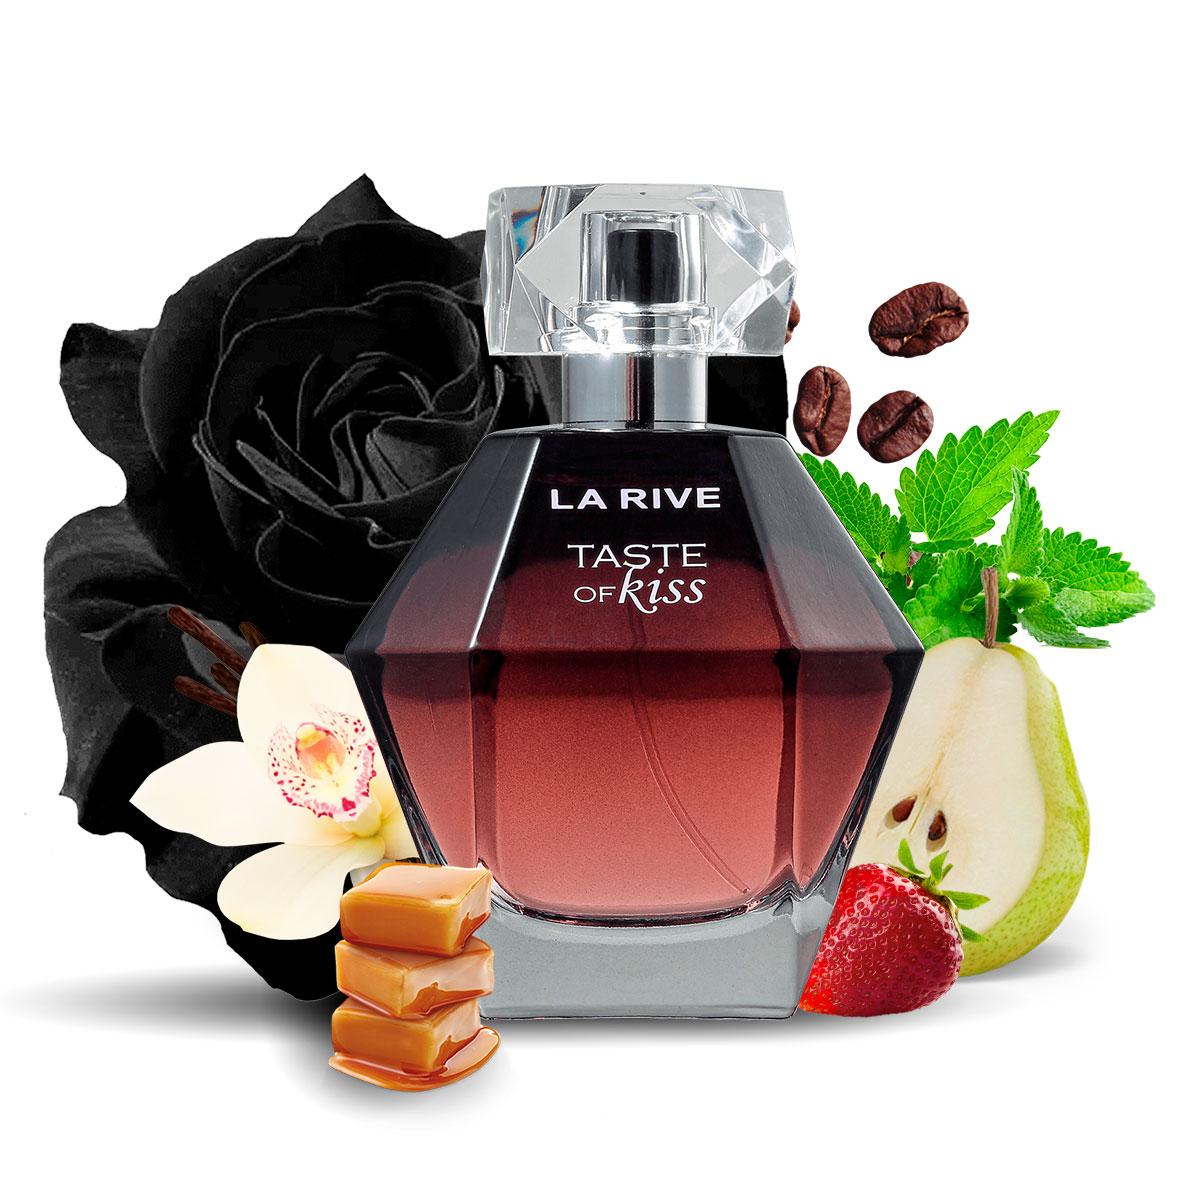 Kit 2 Perfumes, My Only Wish e Taste of Kiss La Rive  - Mercari Perfumes